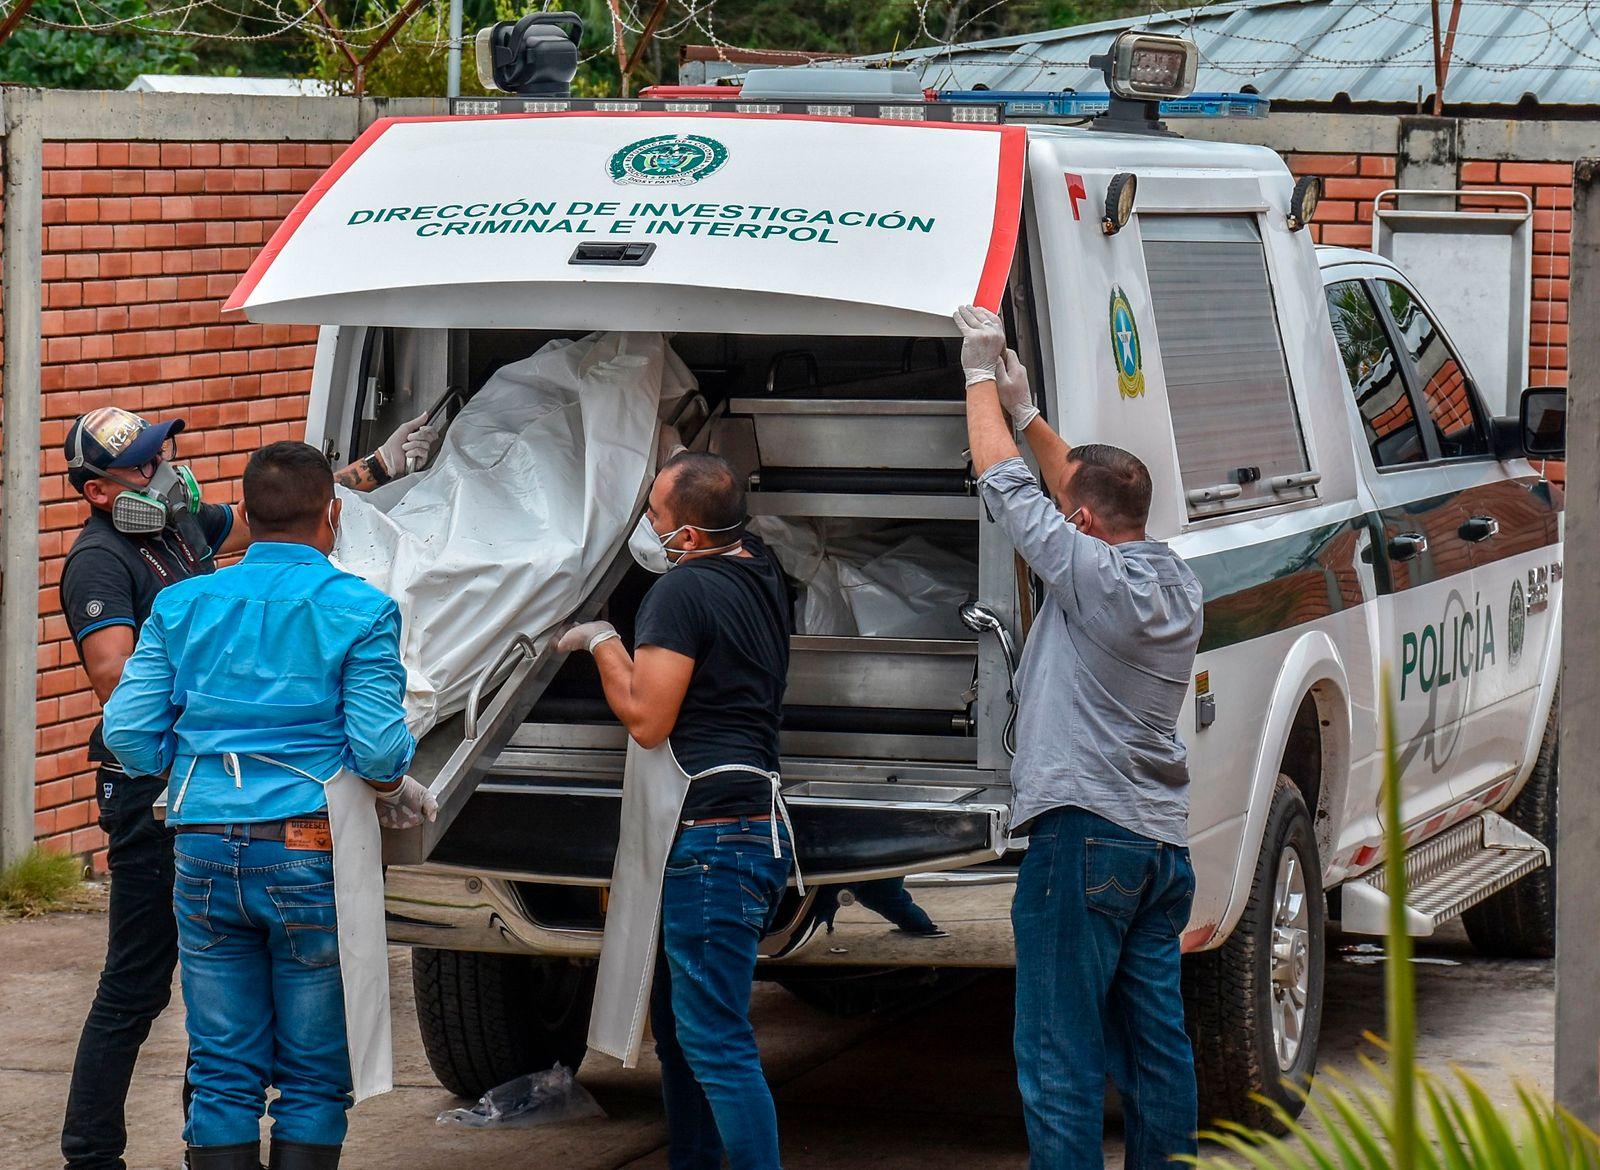 COLOMBIA-CONFLICT-GUERRILLA-CRIME-VIOLENCE